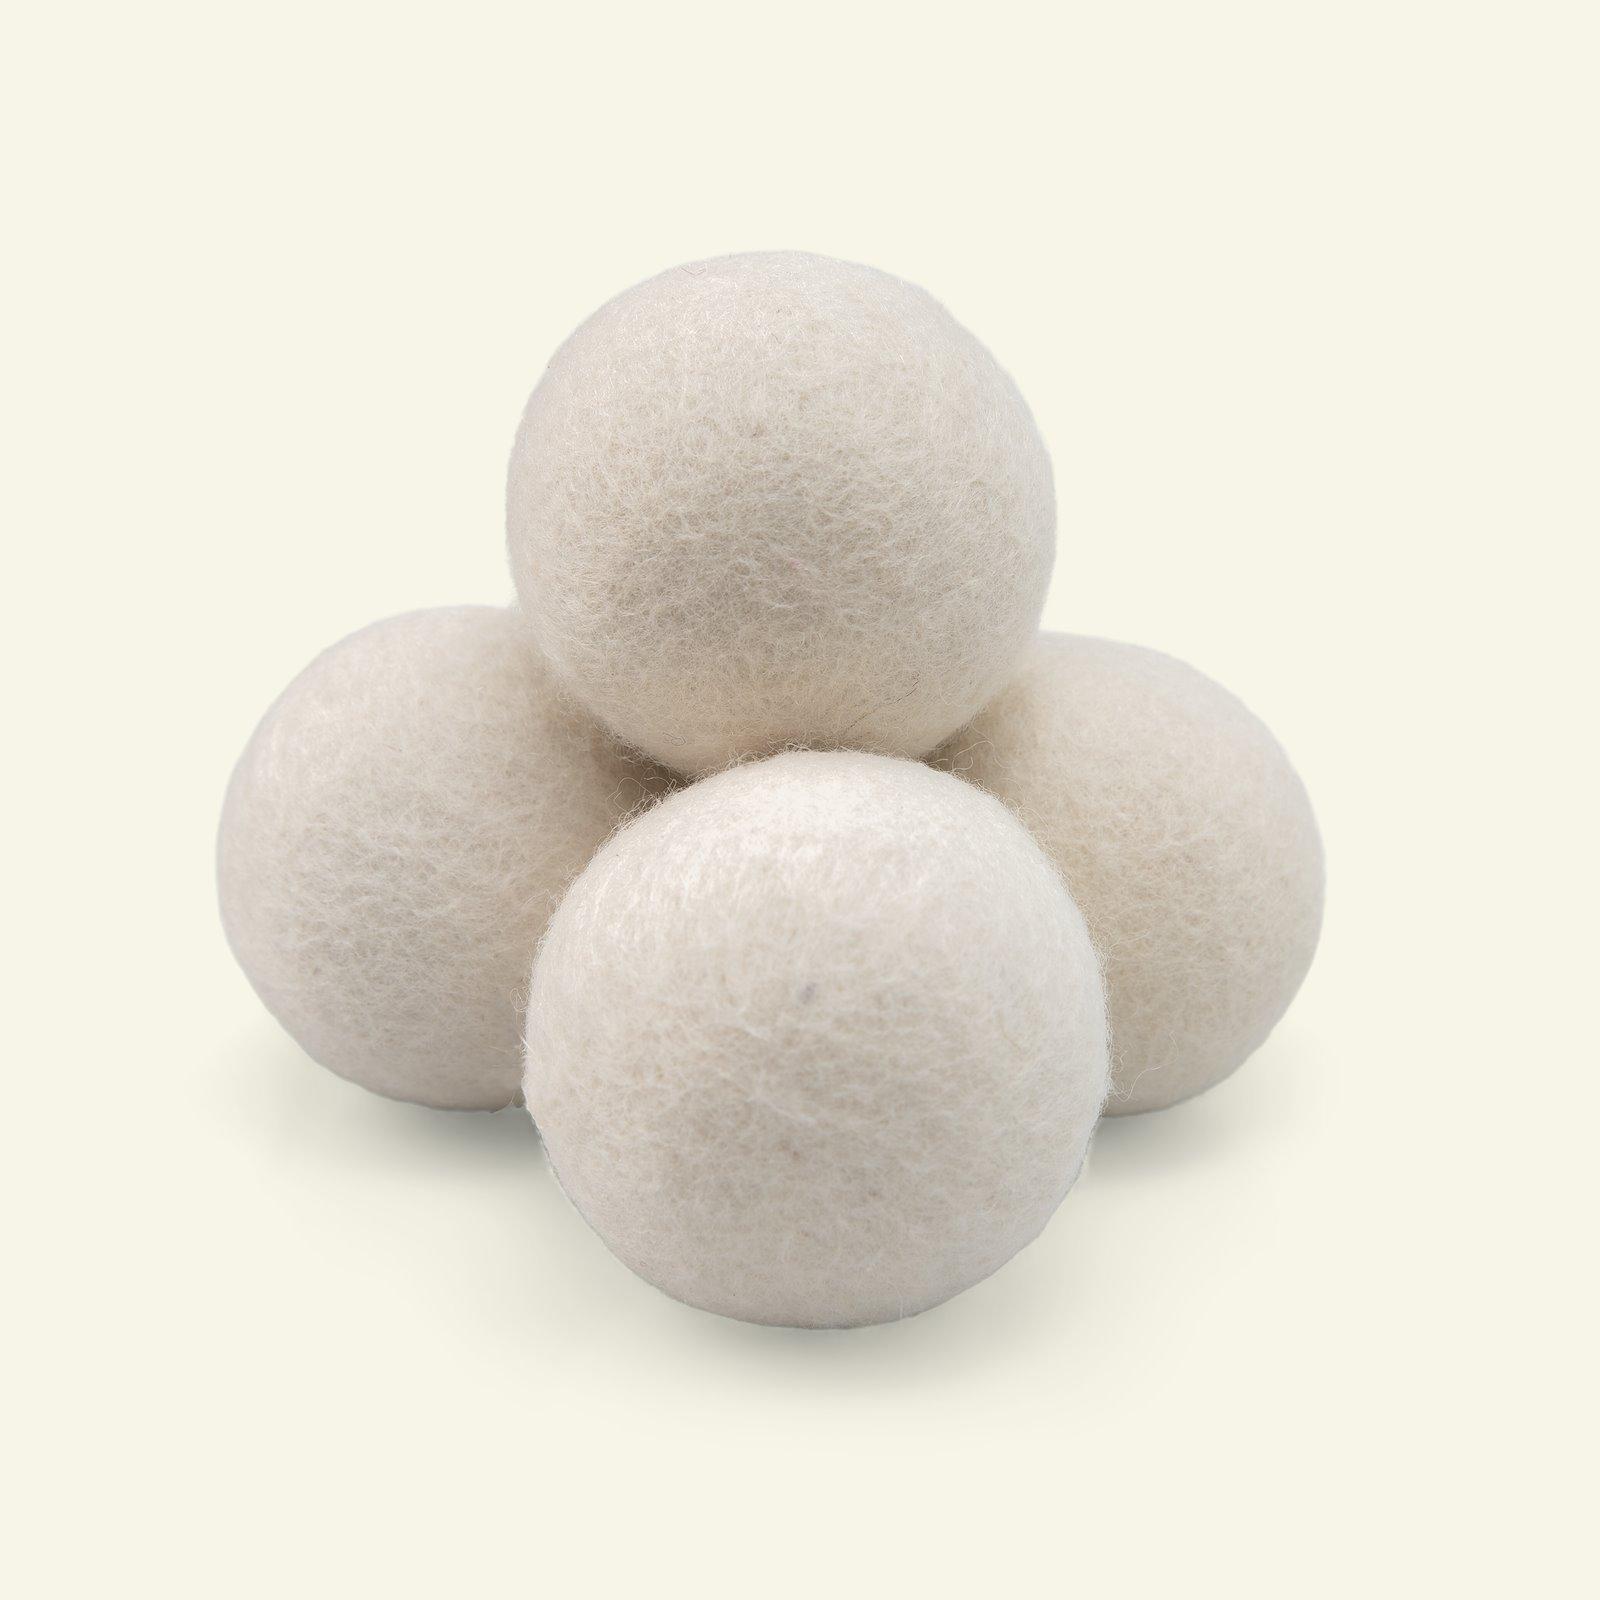 Wool dryer balls white 4pcs 39103_pack_b